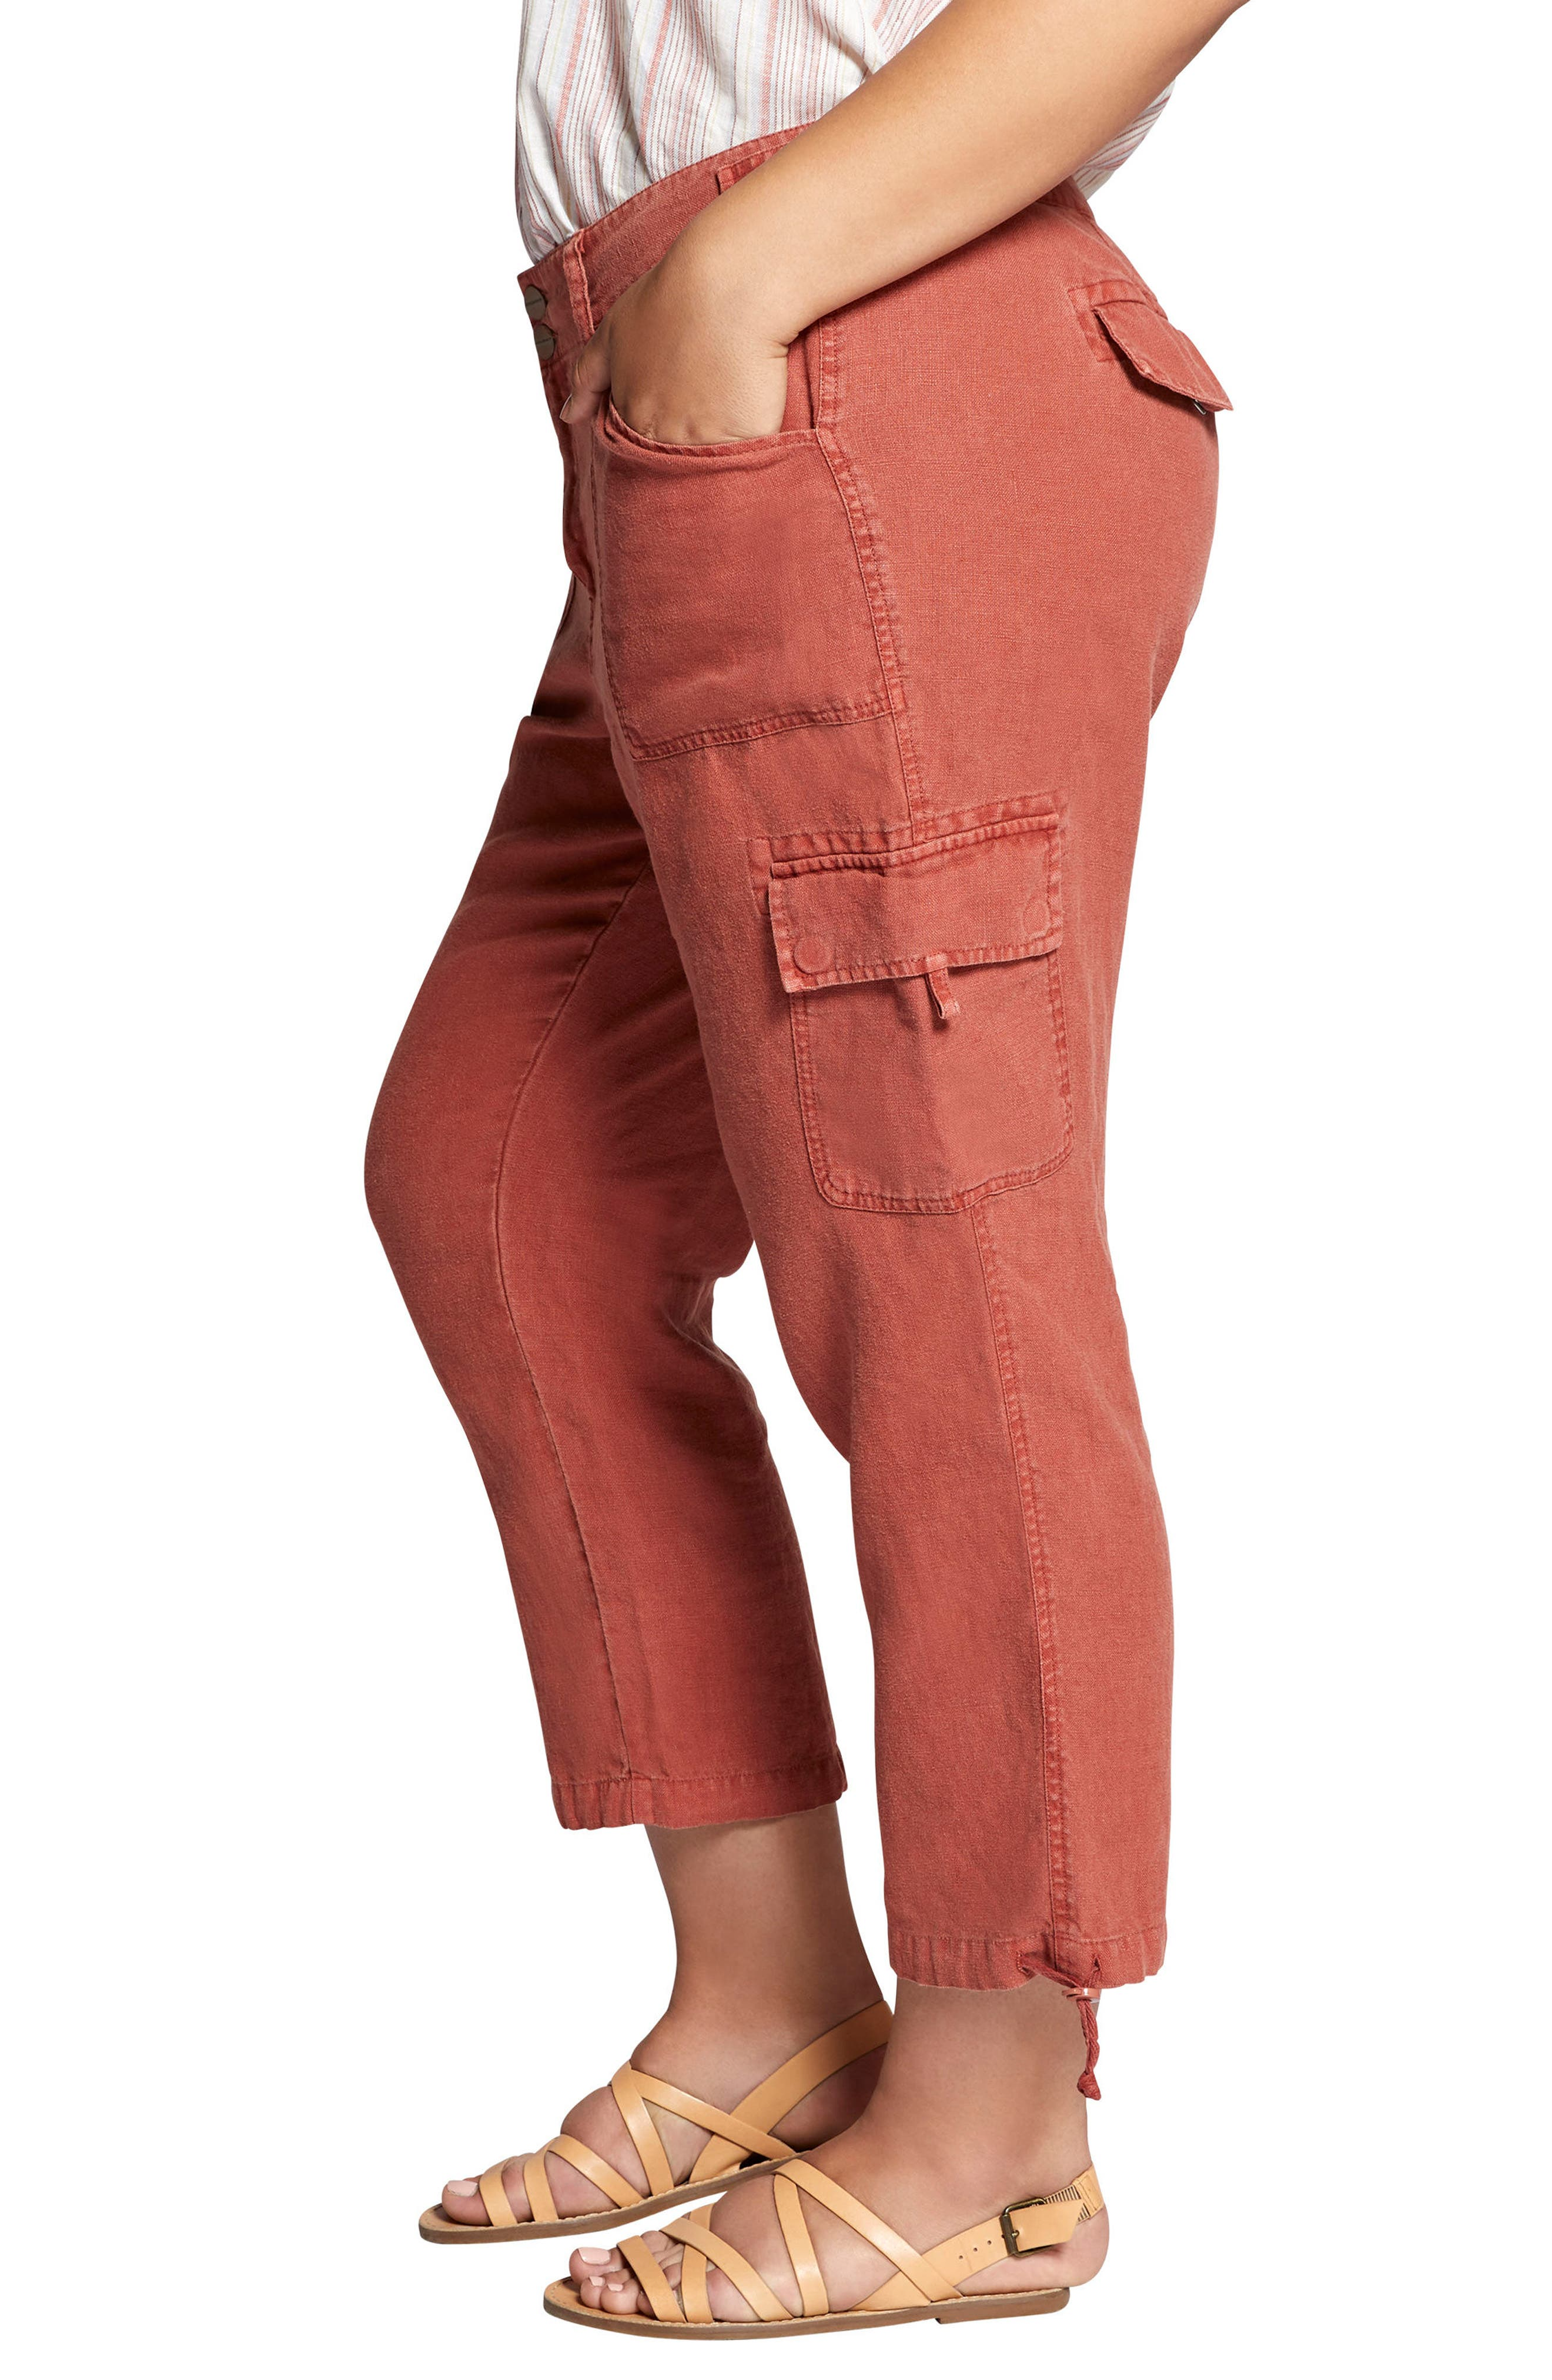 Terrain Crop Linen Cargo Pants,                             Alternate thumbnail 3, color,                             Terra Cotta